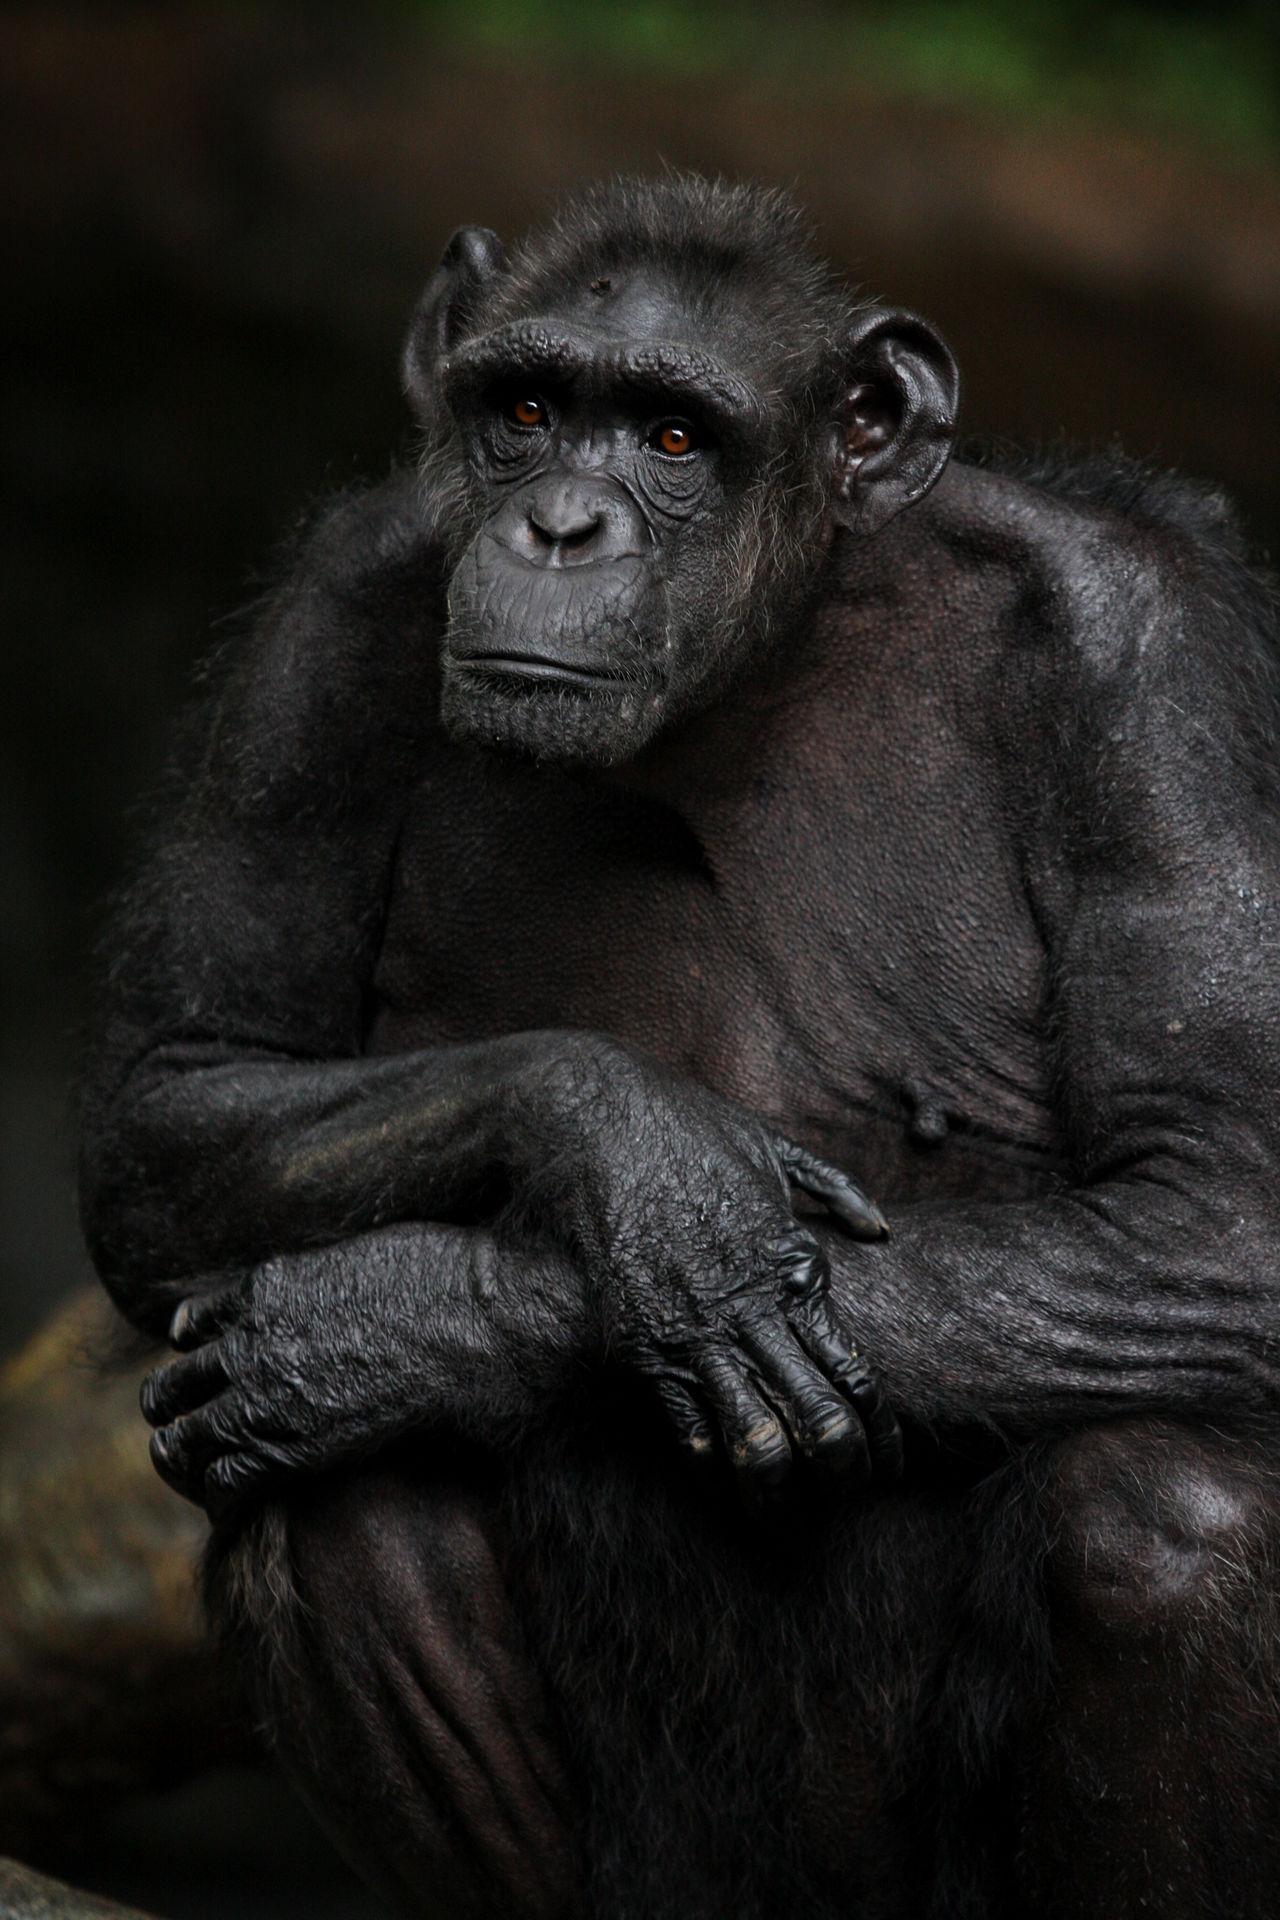 Orang Utang Animal Themes Animal Wildlife Animals In The Wild Ape Black Background Animal Care Chimpanzee Close-up Day Gorilla Mammal Mongkey Monkey Nature No People Orangutan Outdoors Primate Sitting